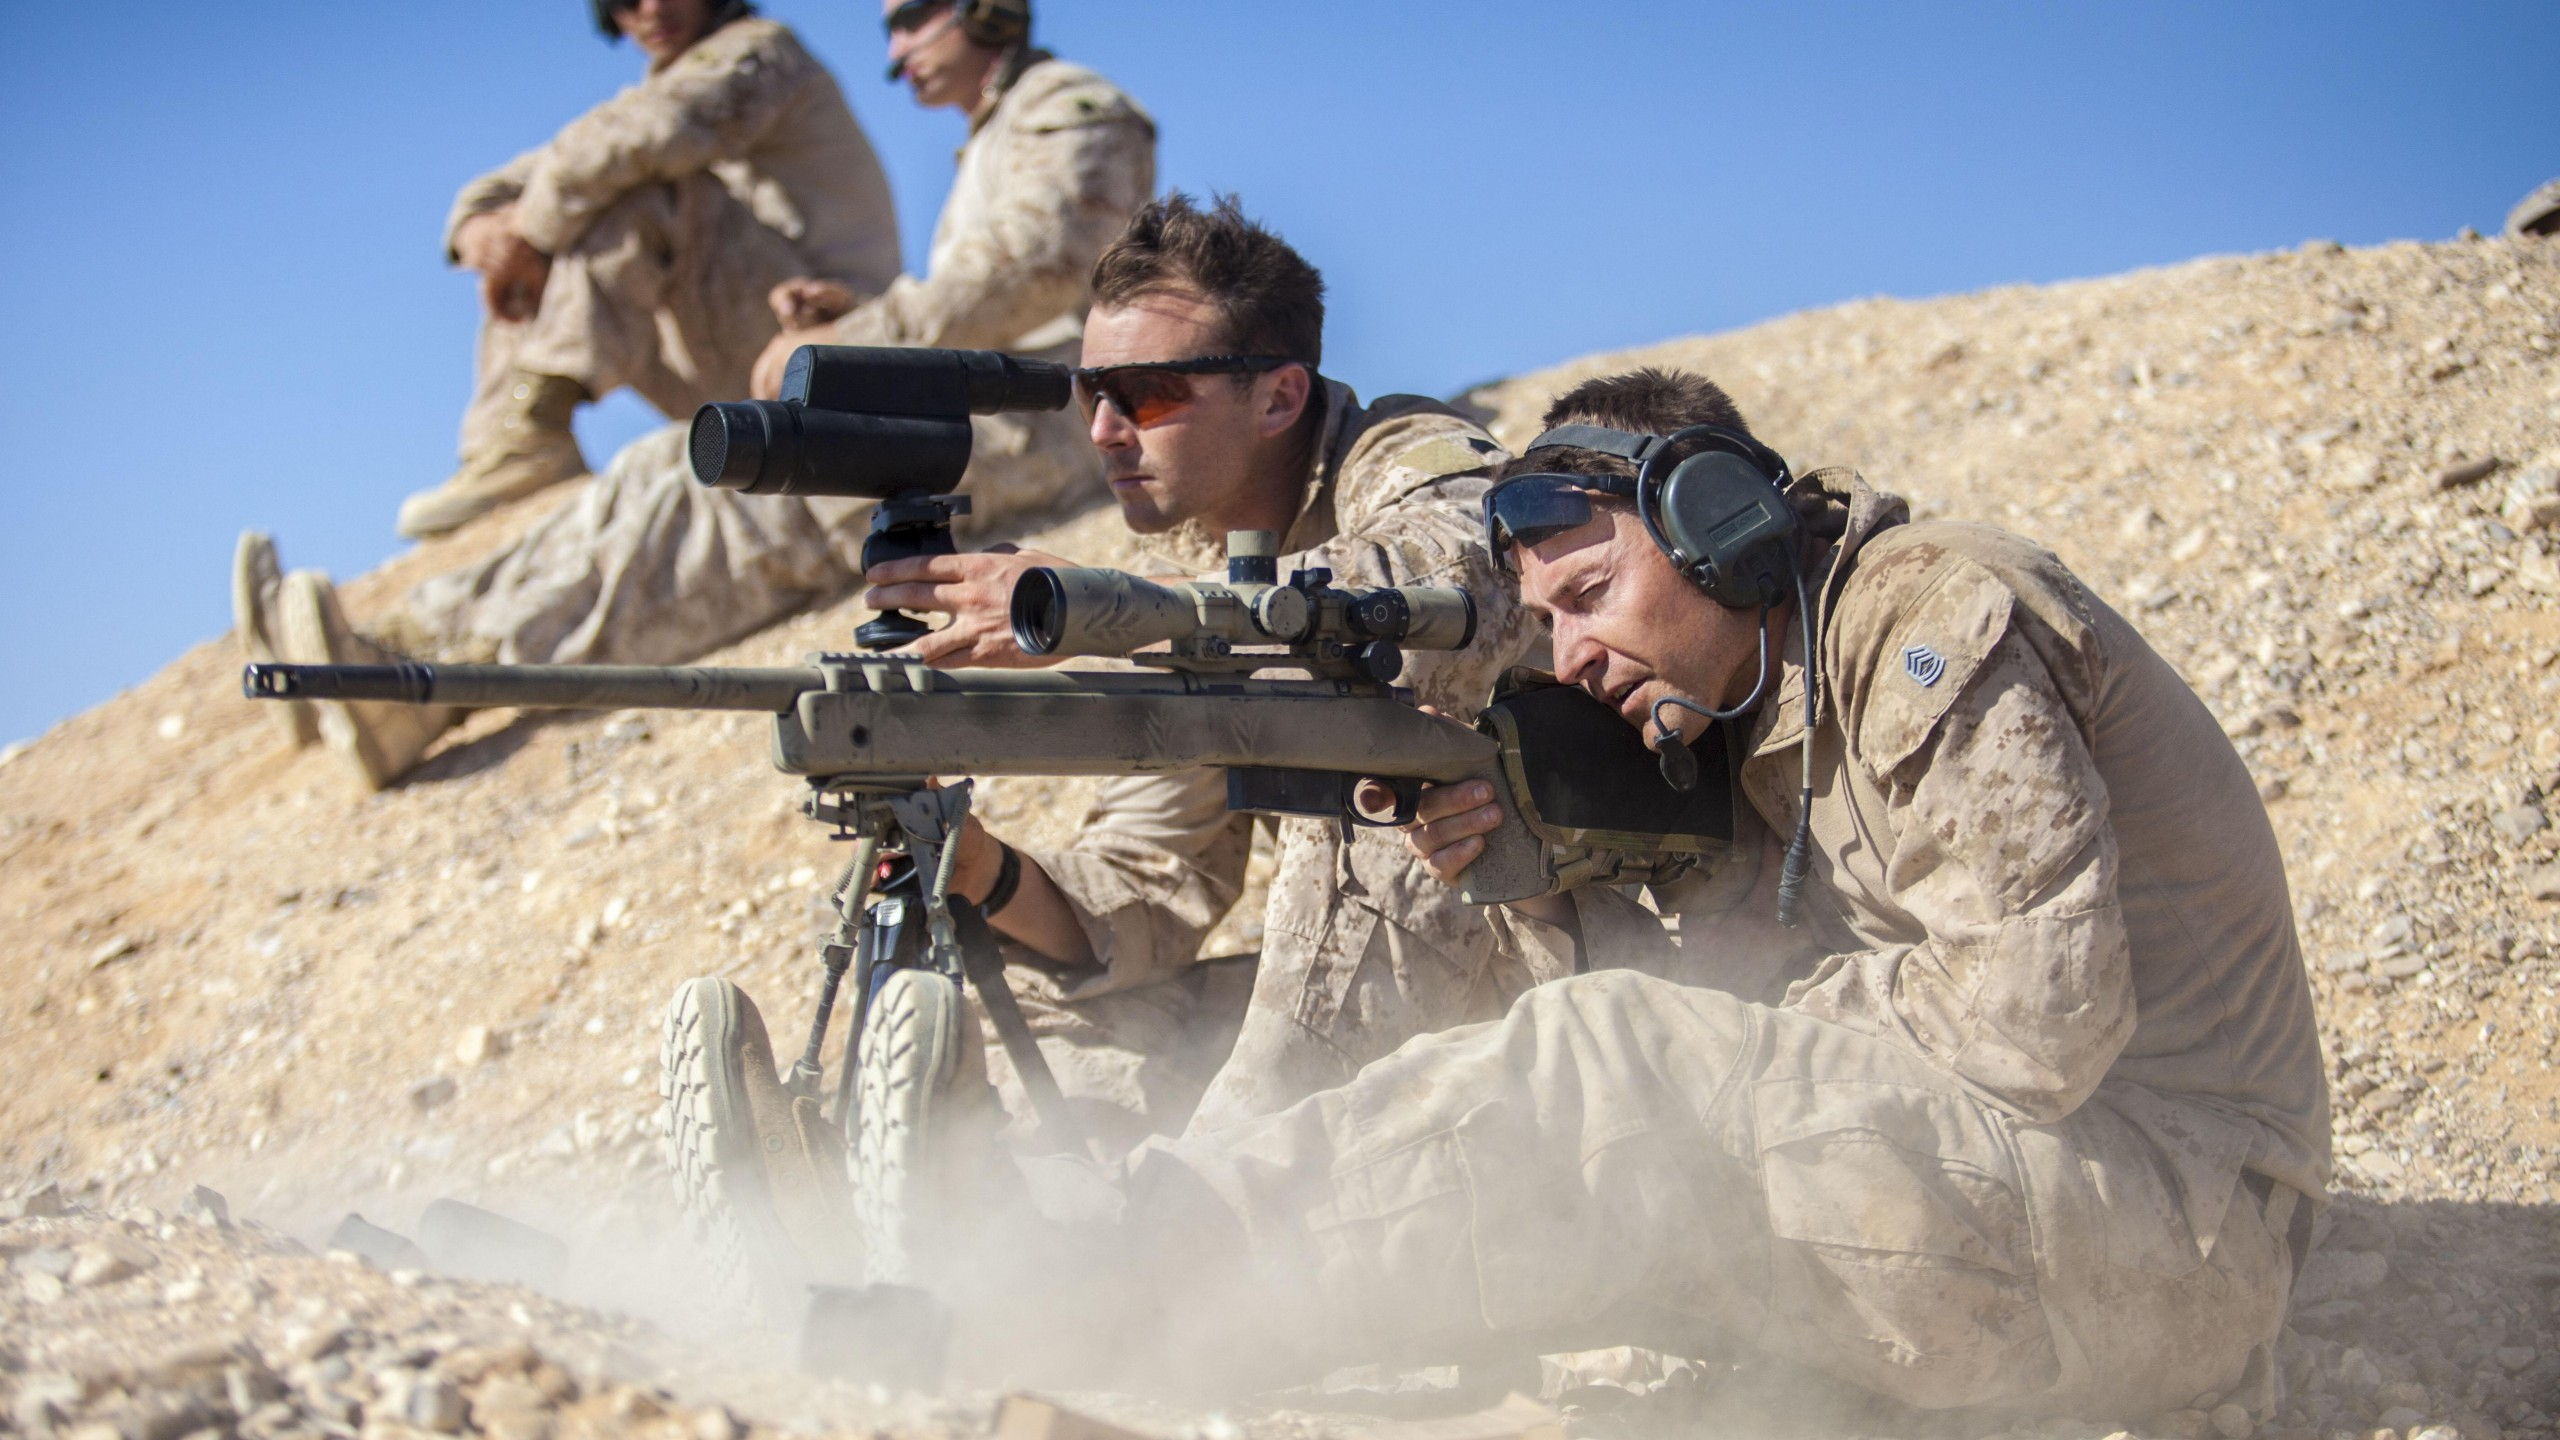 Wallpaper Chris Kyle Sniper Sniper Rifle Biography Us